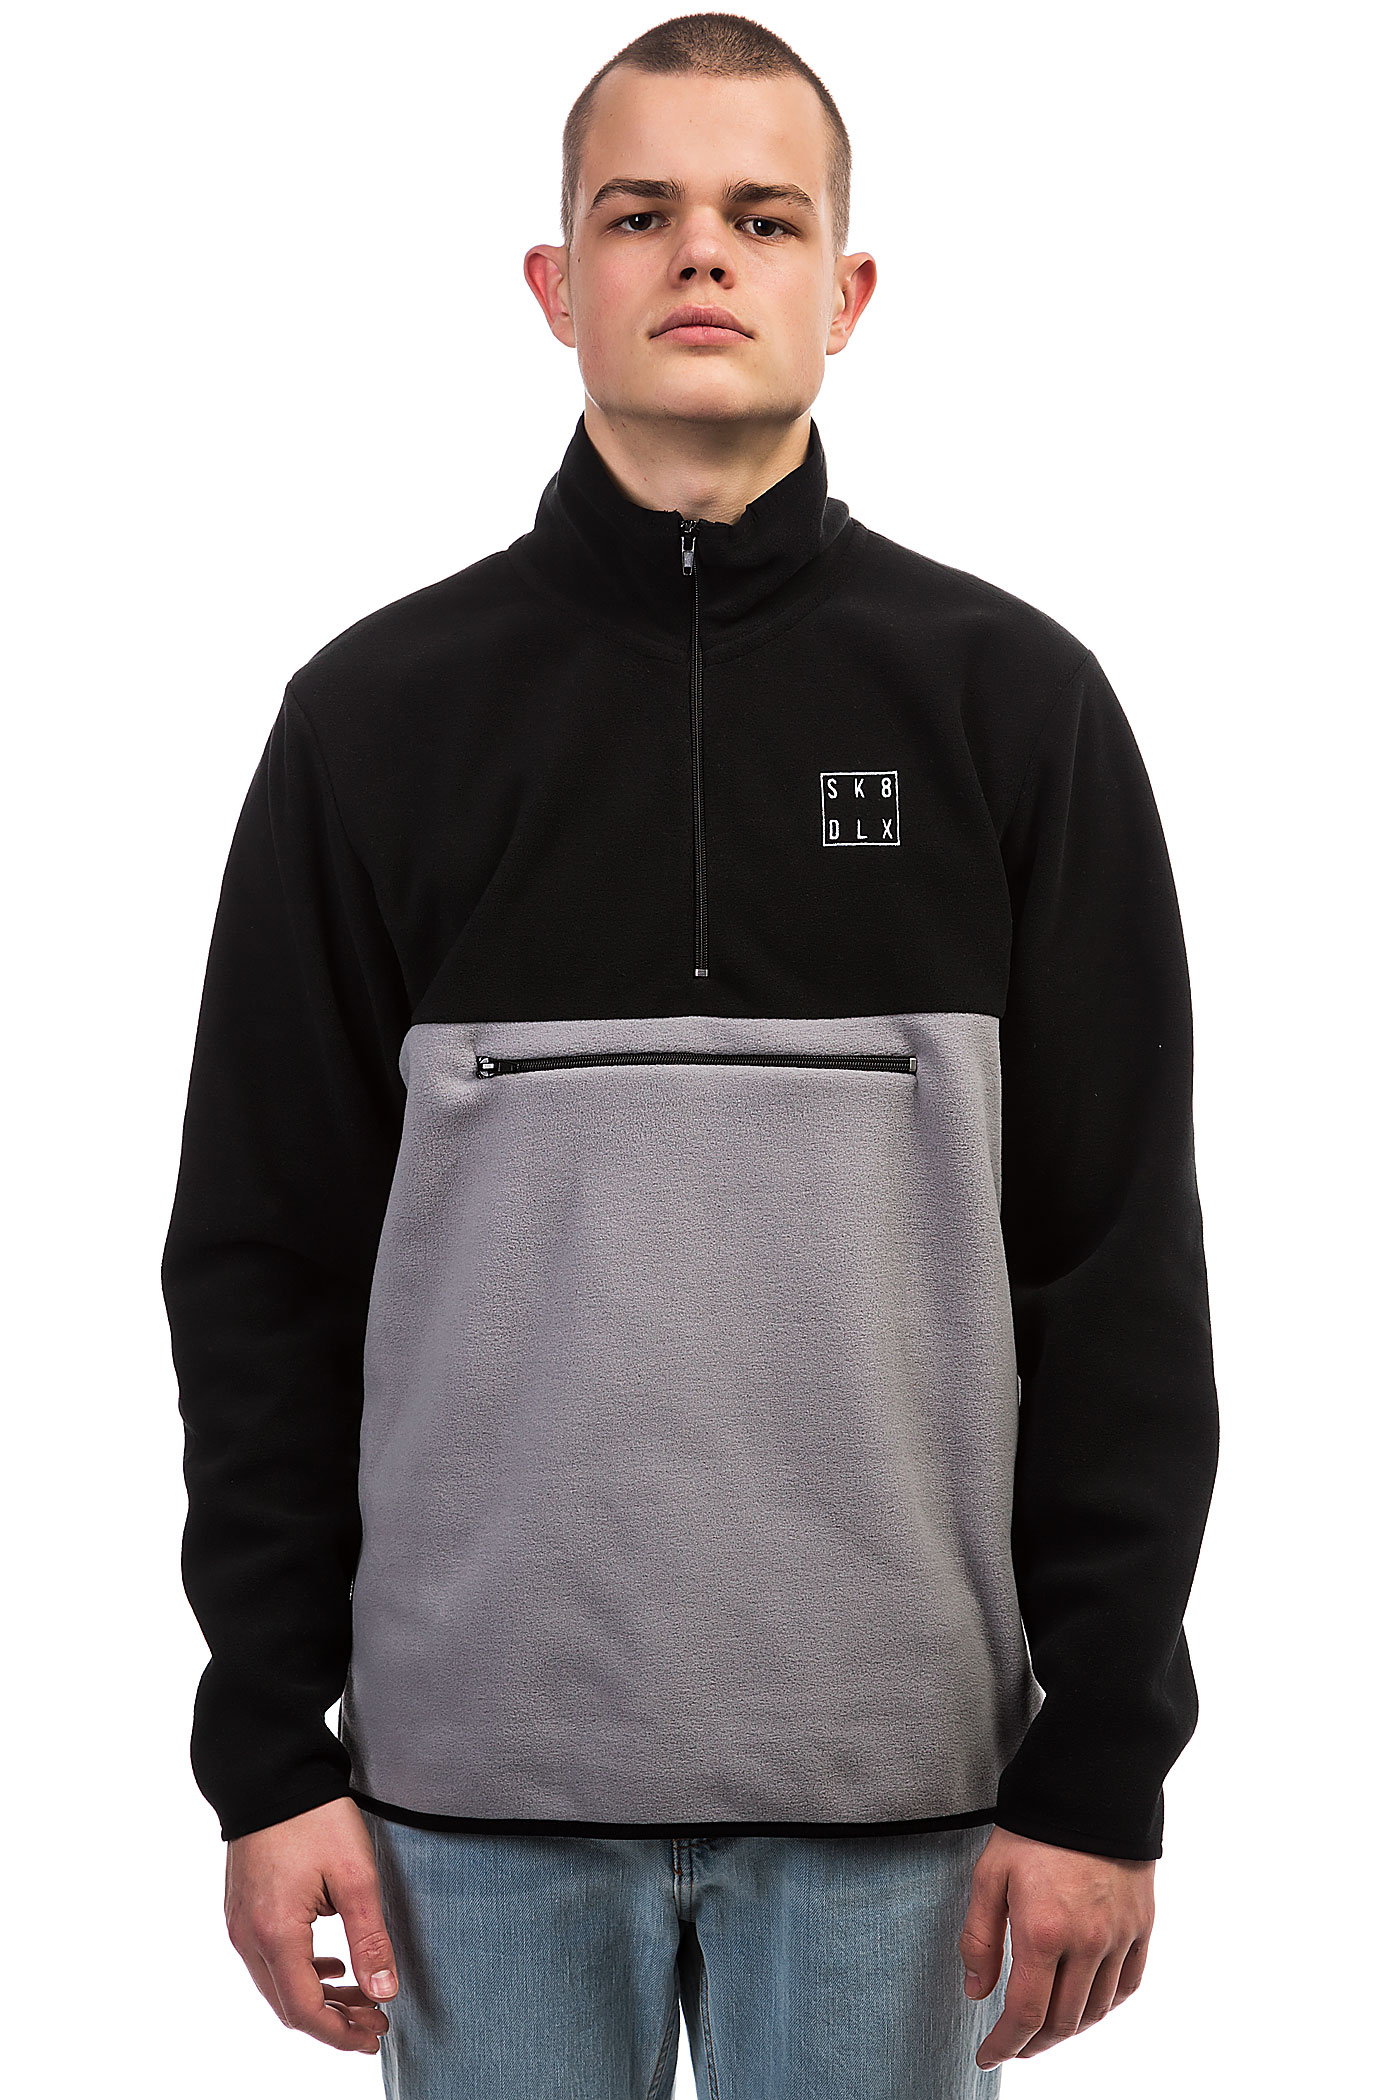 Half Fleece Sk8dlx Zip Sweatshirtblack Grey Square kPZTOiuX